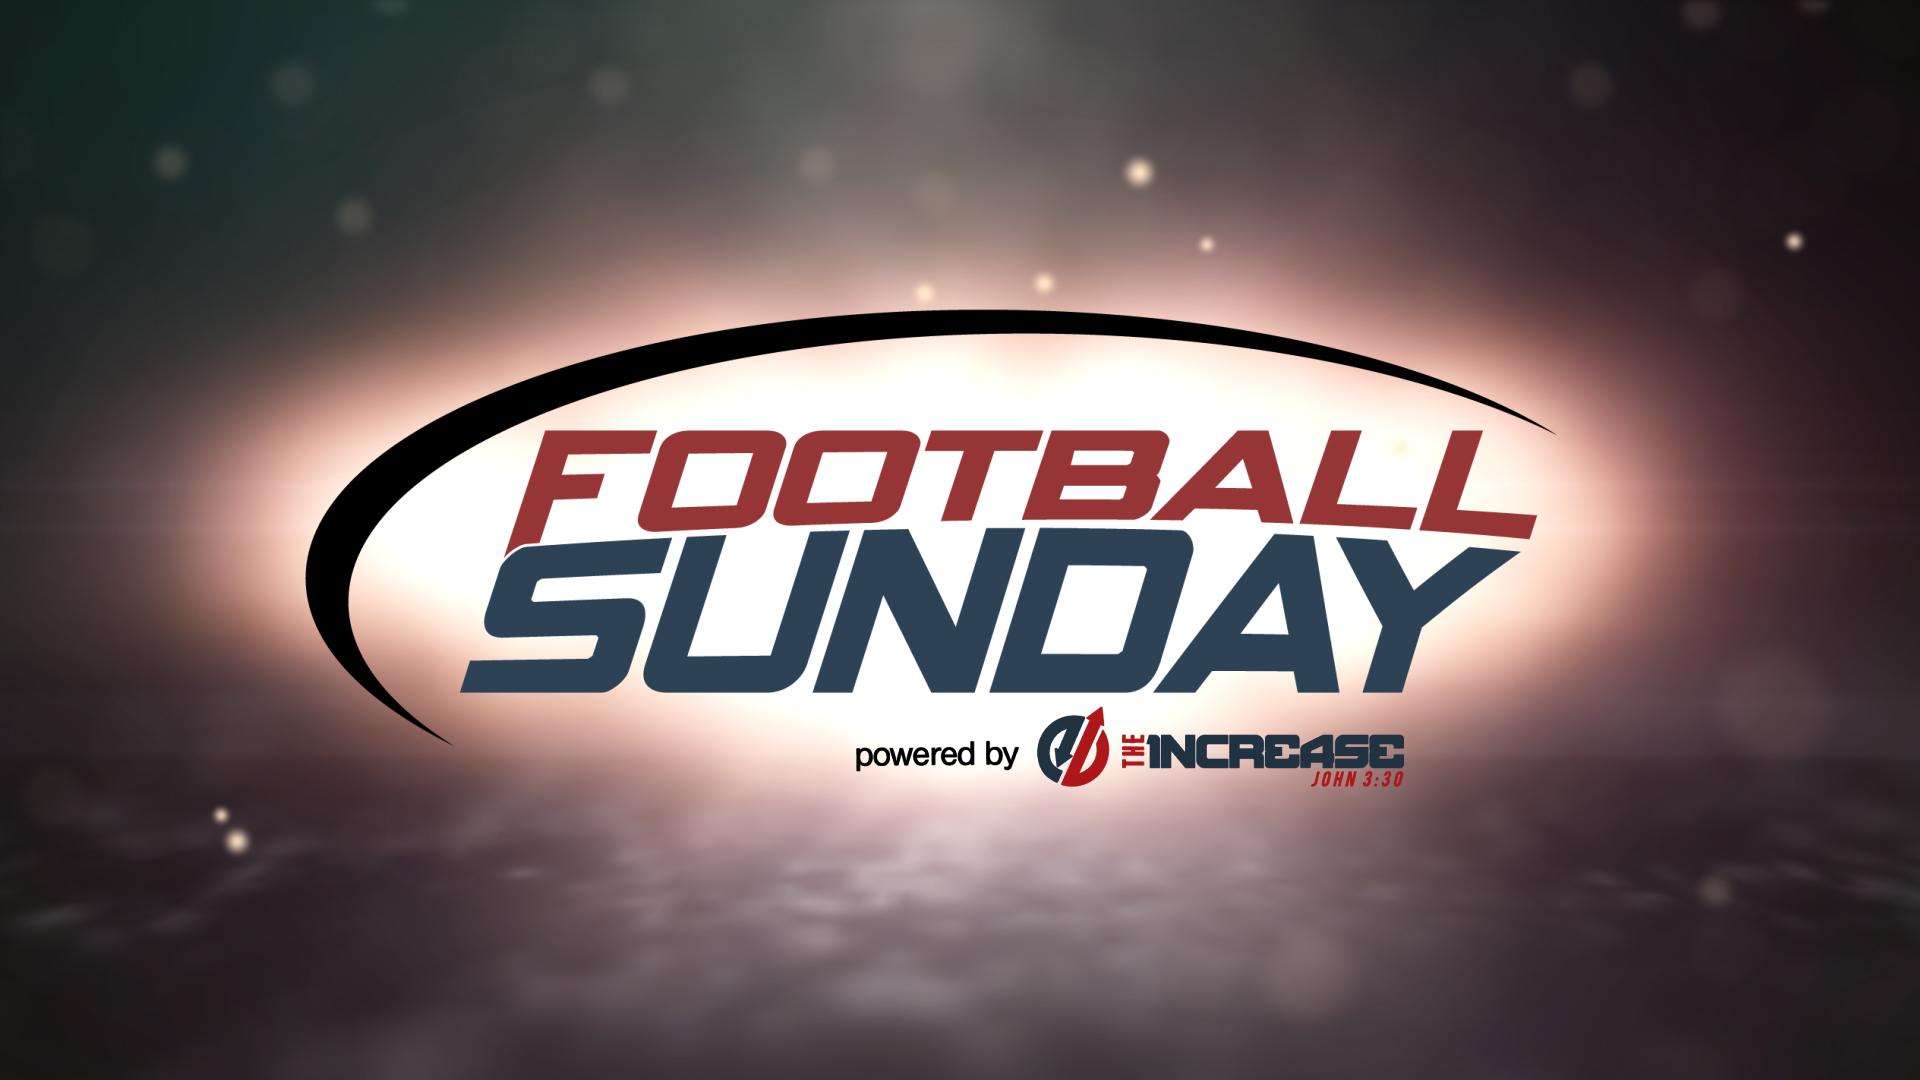 Football_Sunday_2017_-_Logo.jpg